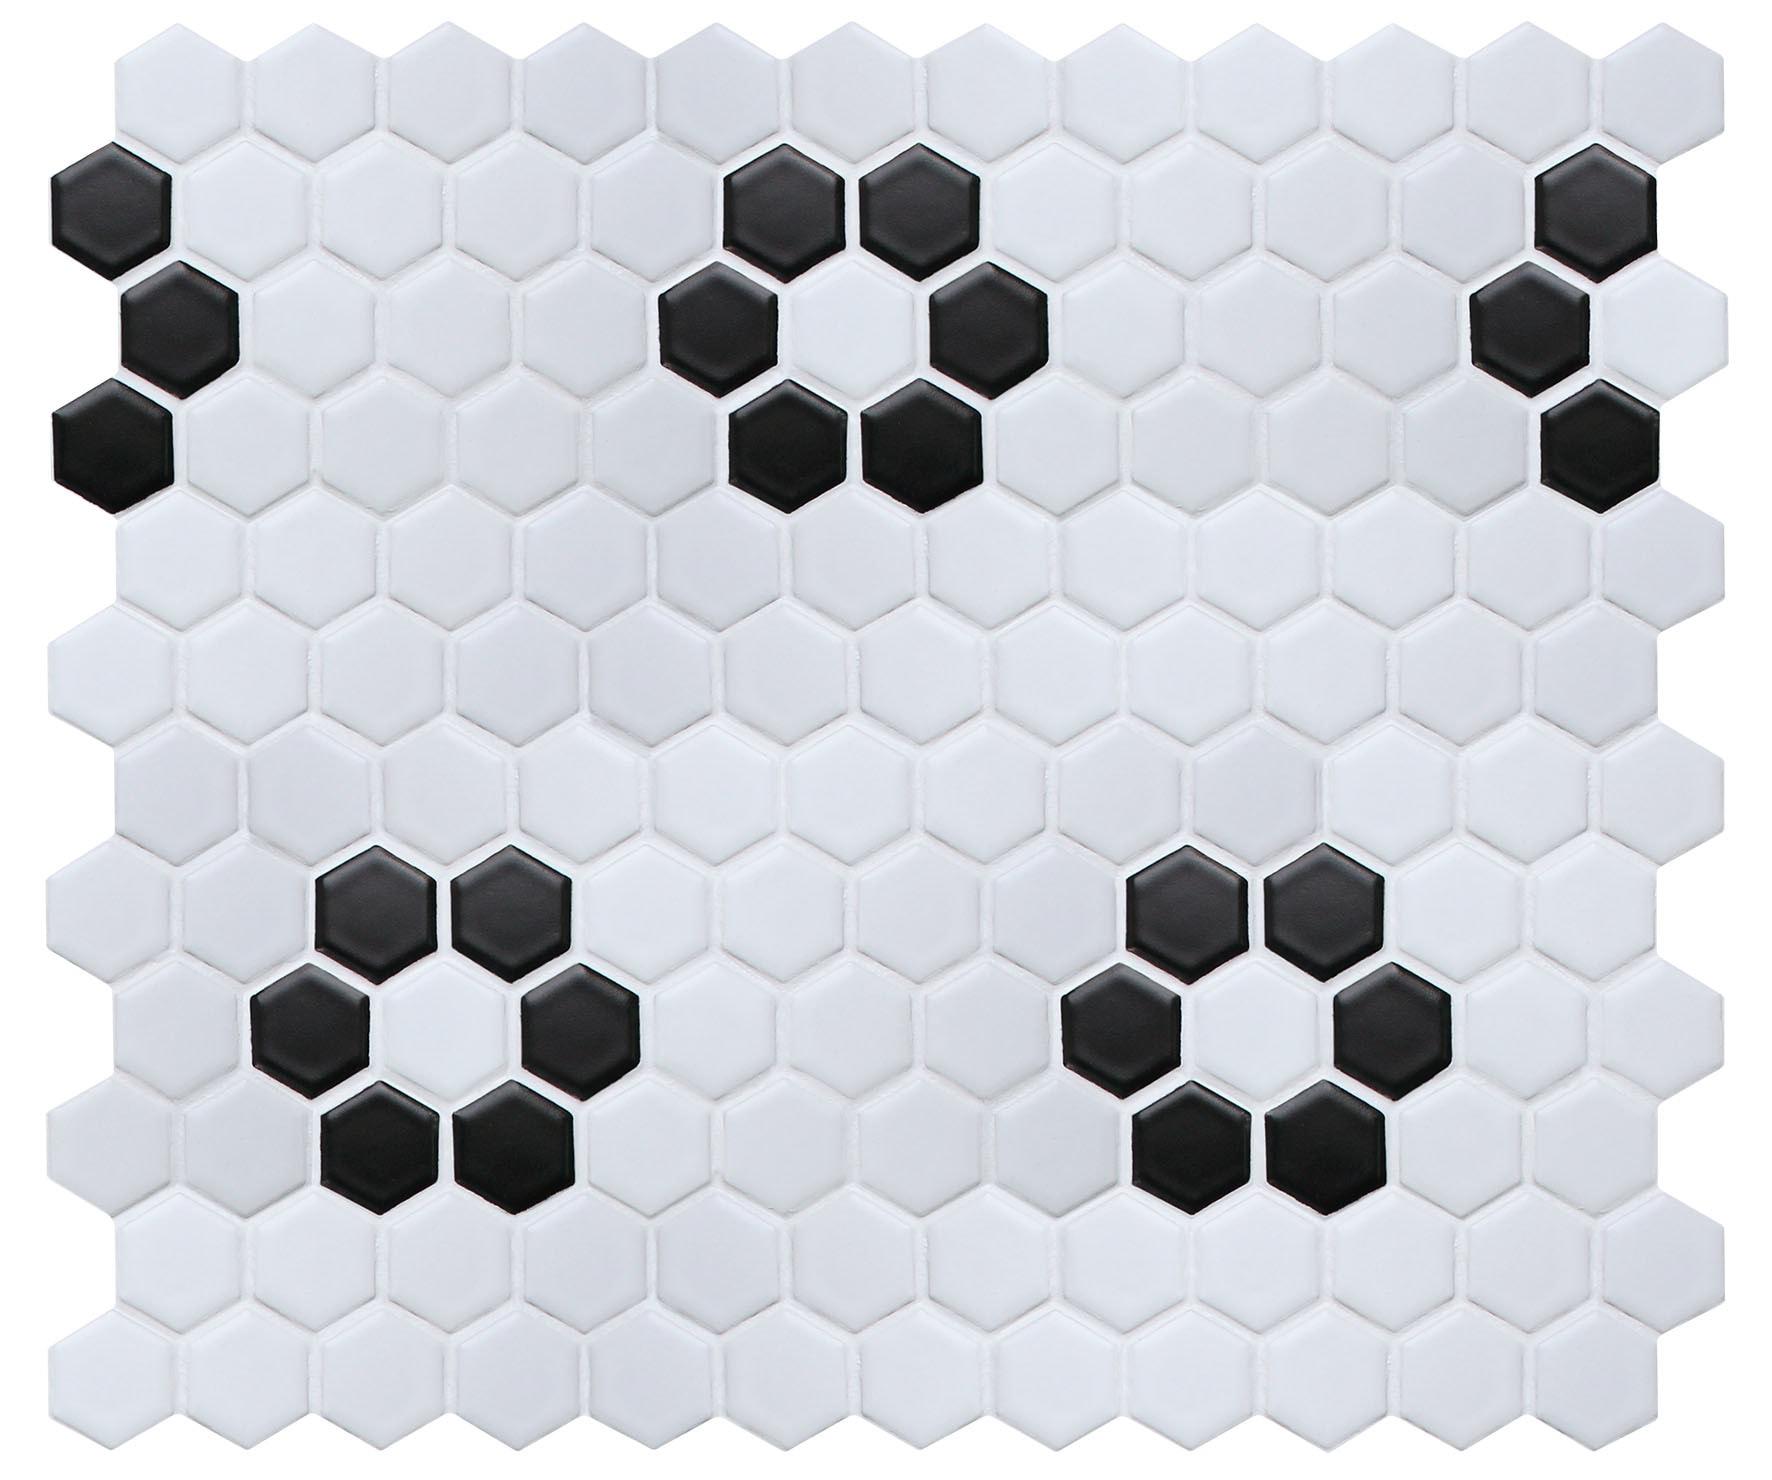 "11.75 x 10.25 x 0.2 inches / Matte Retro 1"" Hex Porcelain Matte Floor & Wall Tile in White/Black Flower 0"